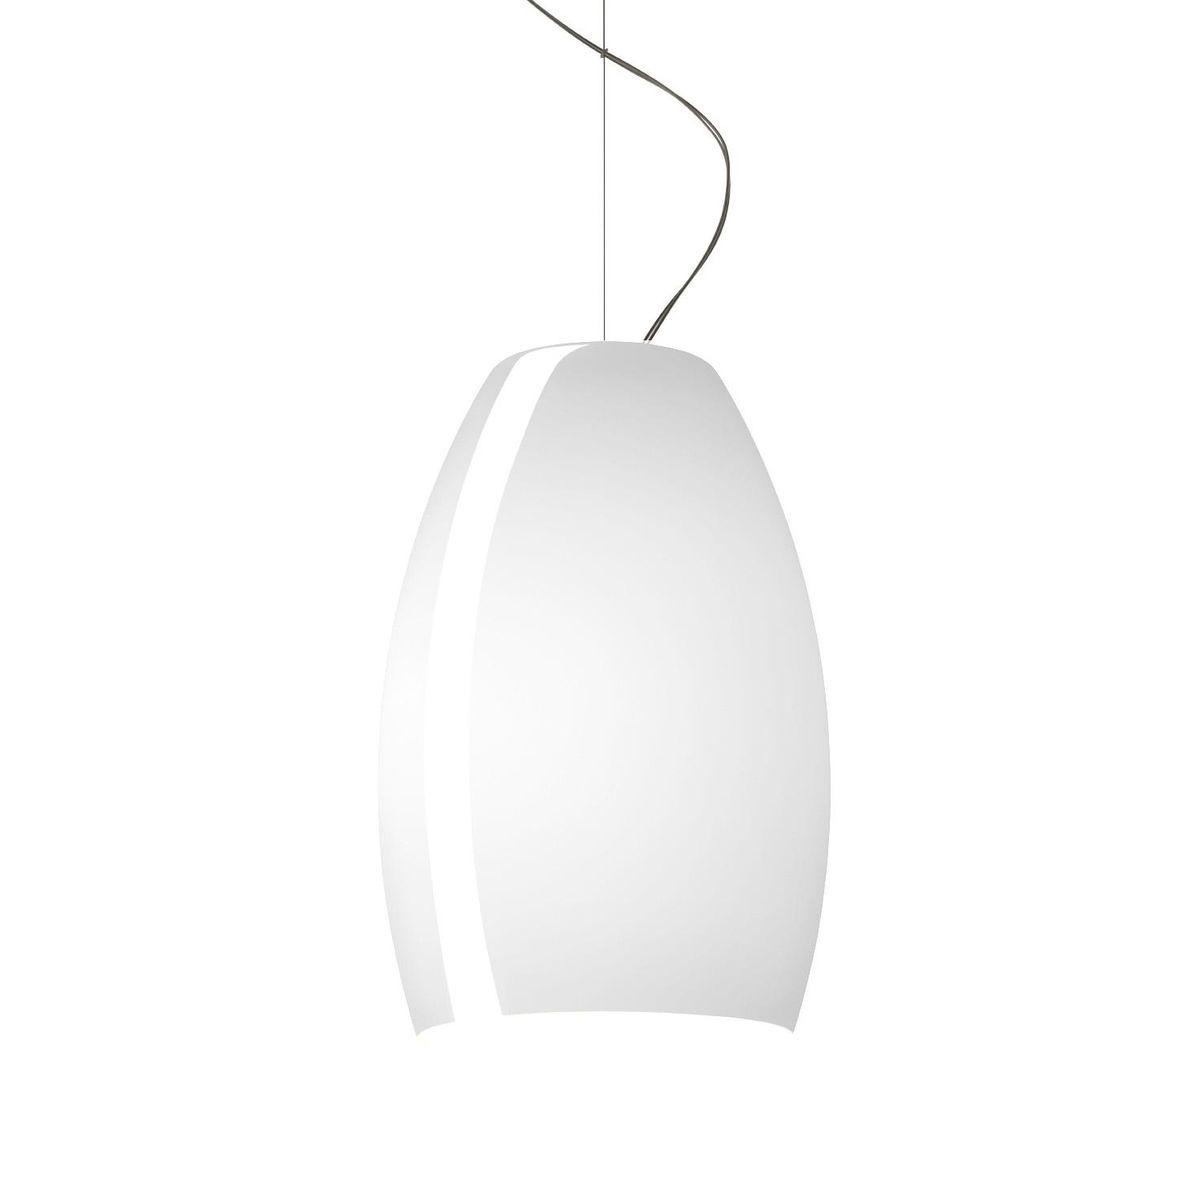 Buds 1 Lámpara colgante sin florón E27 1x23W Blanco cálido